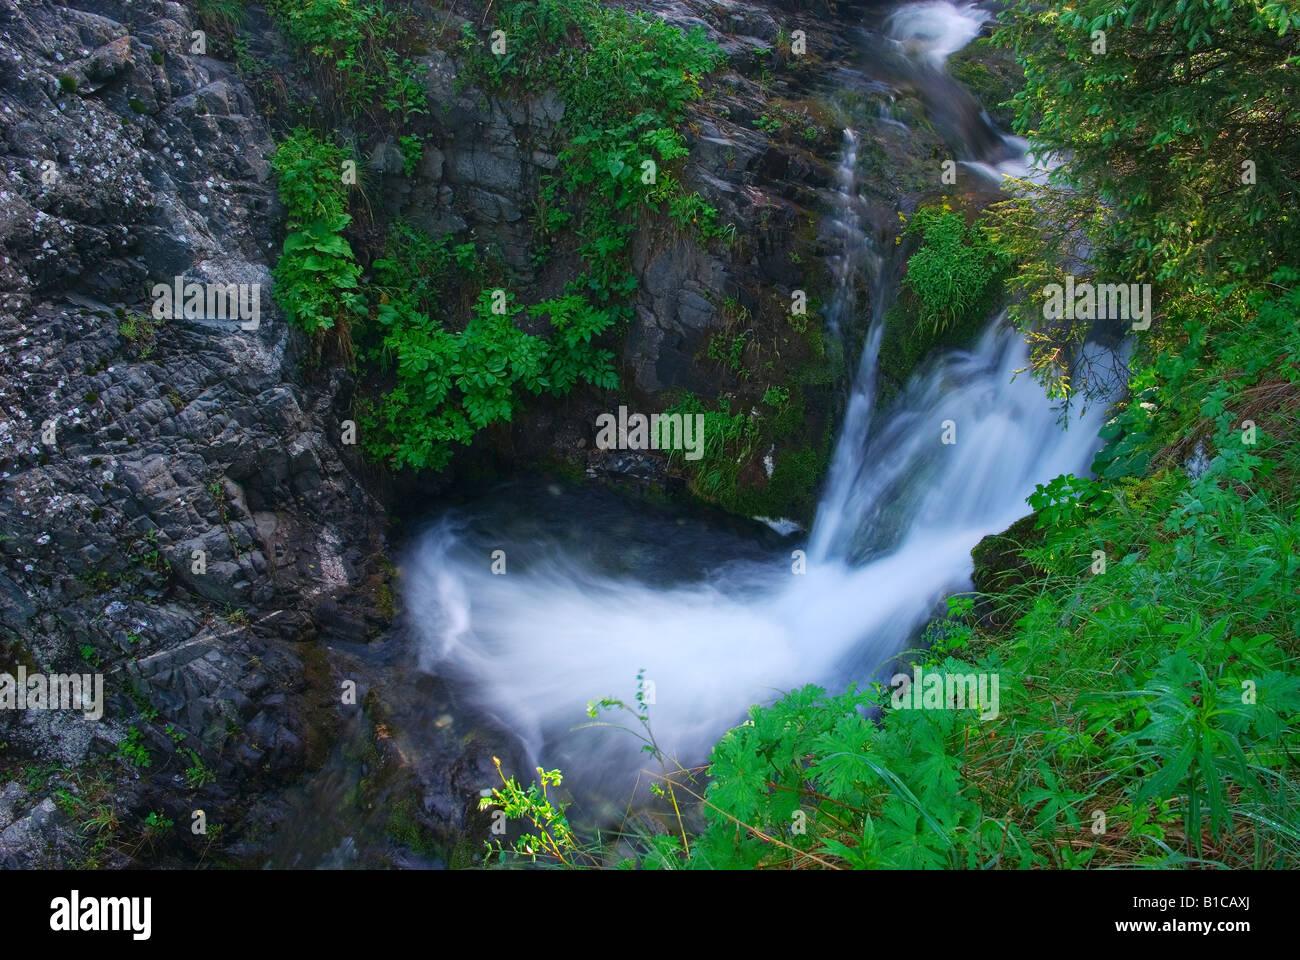 Cascades on creek - Stock Image